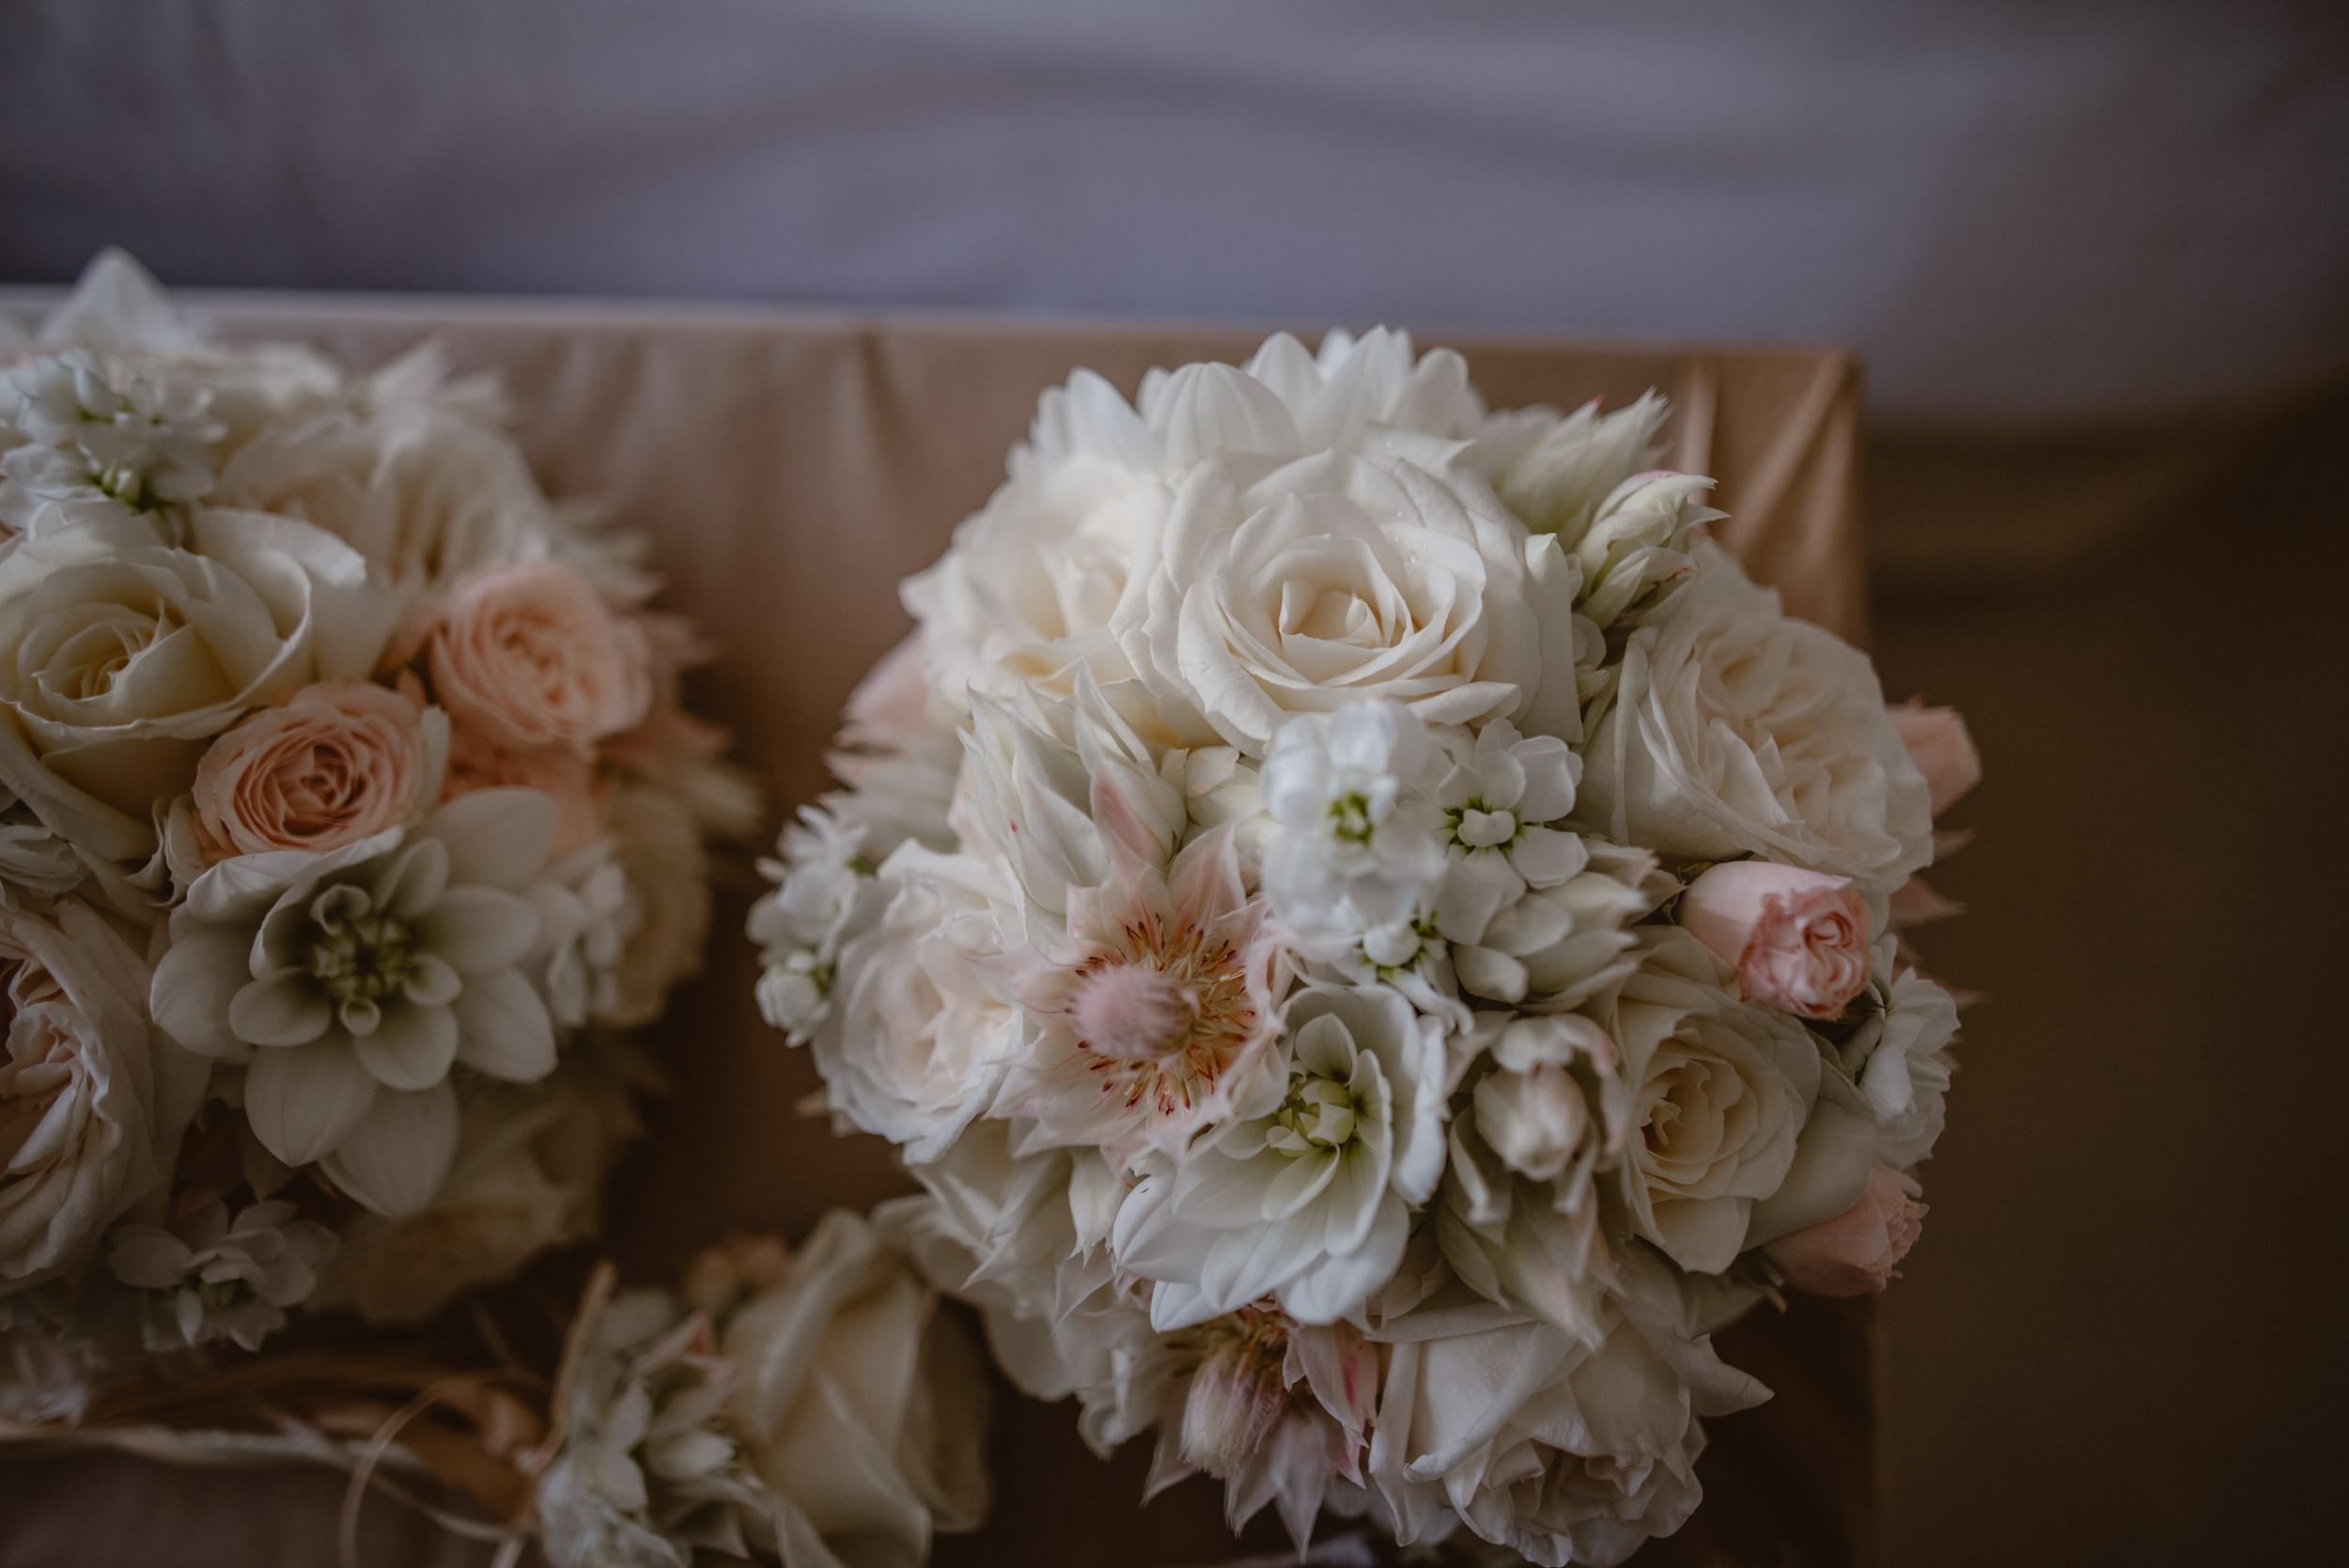 Trisha-and-Roger-wedding-The-Priory-Church-and-Chewton-Glen-Hotel-Christchurch-Manu-Mendoza-Wedding-Photography-007.jpg